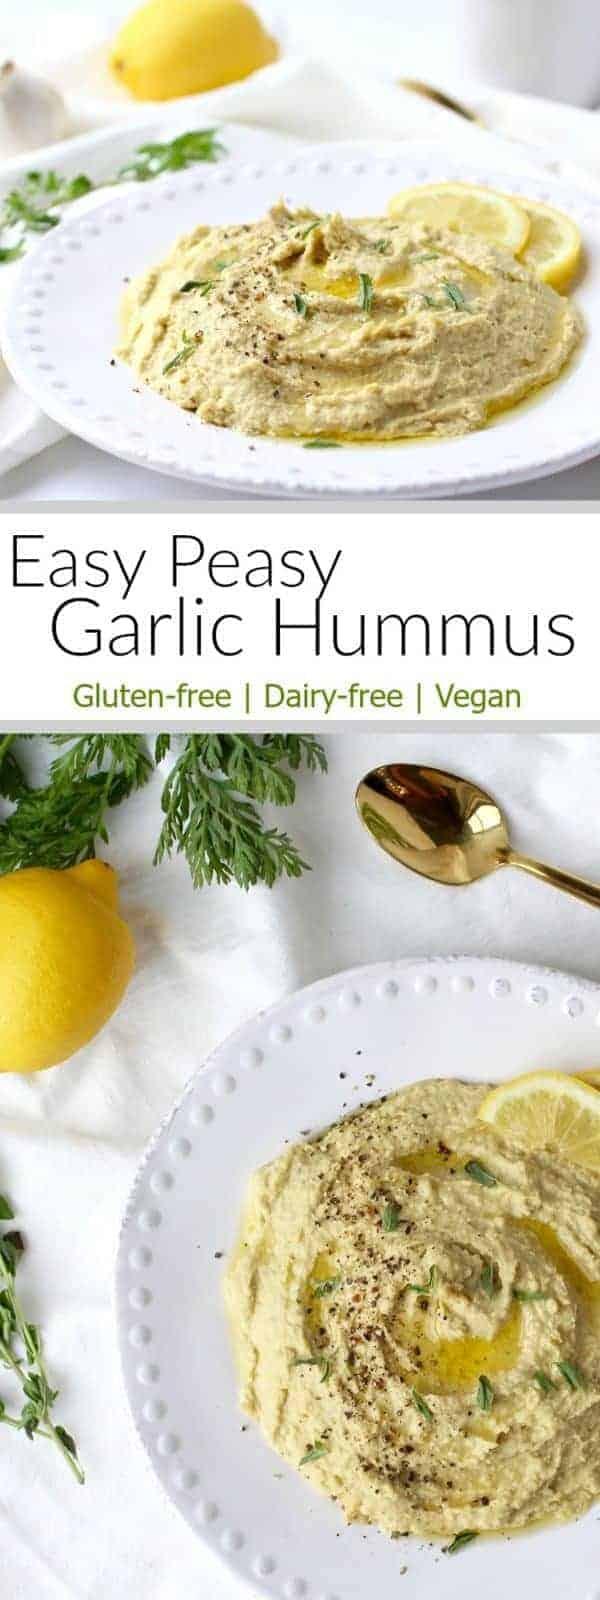 Easy Peasy Garlic Hummus | how to make homemade hummus | easy hummus recipes | garlic hummus recipes | healthy appetizer recipes | healthy dip recipes | gluten-free hummus recipes | dairy-free hummus recipes | vegan hummus recipes | gluten free appetizers | dairy free appetizers | vegan appetizers || The Real Food Dietitians